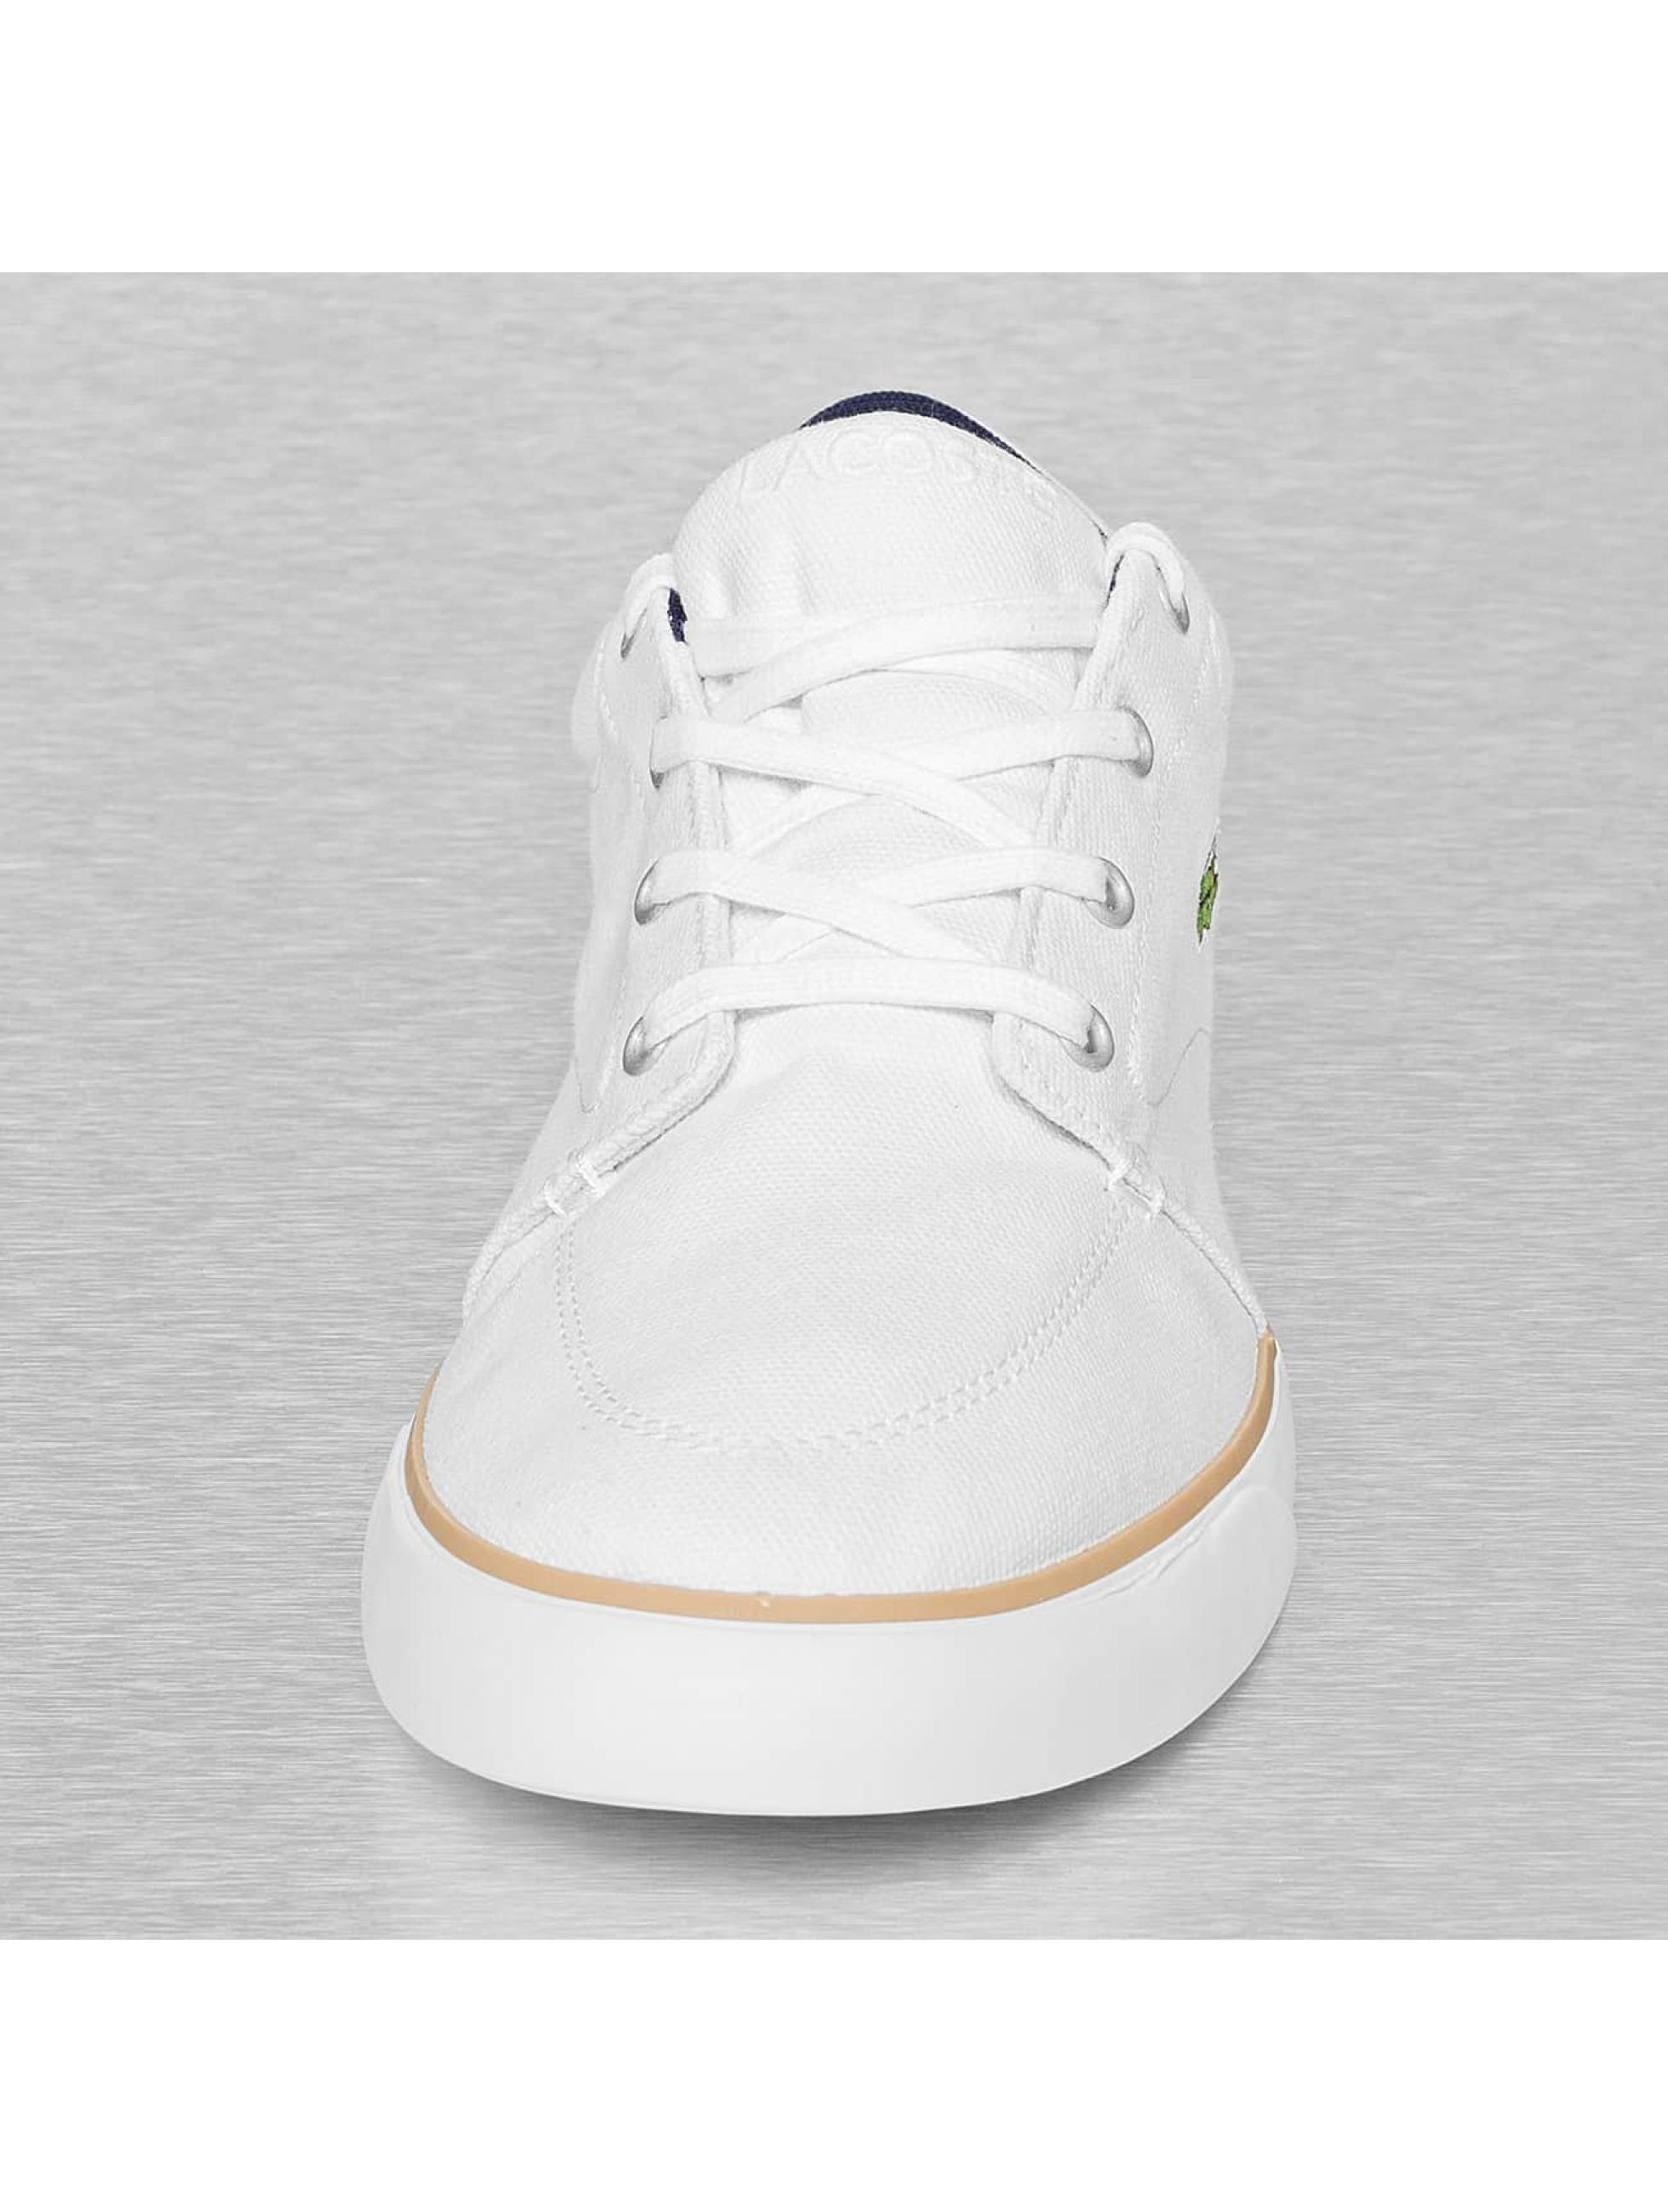 Lacoste Baskets Bayliss 116 SPM blanc